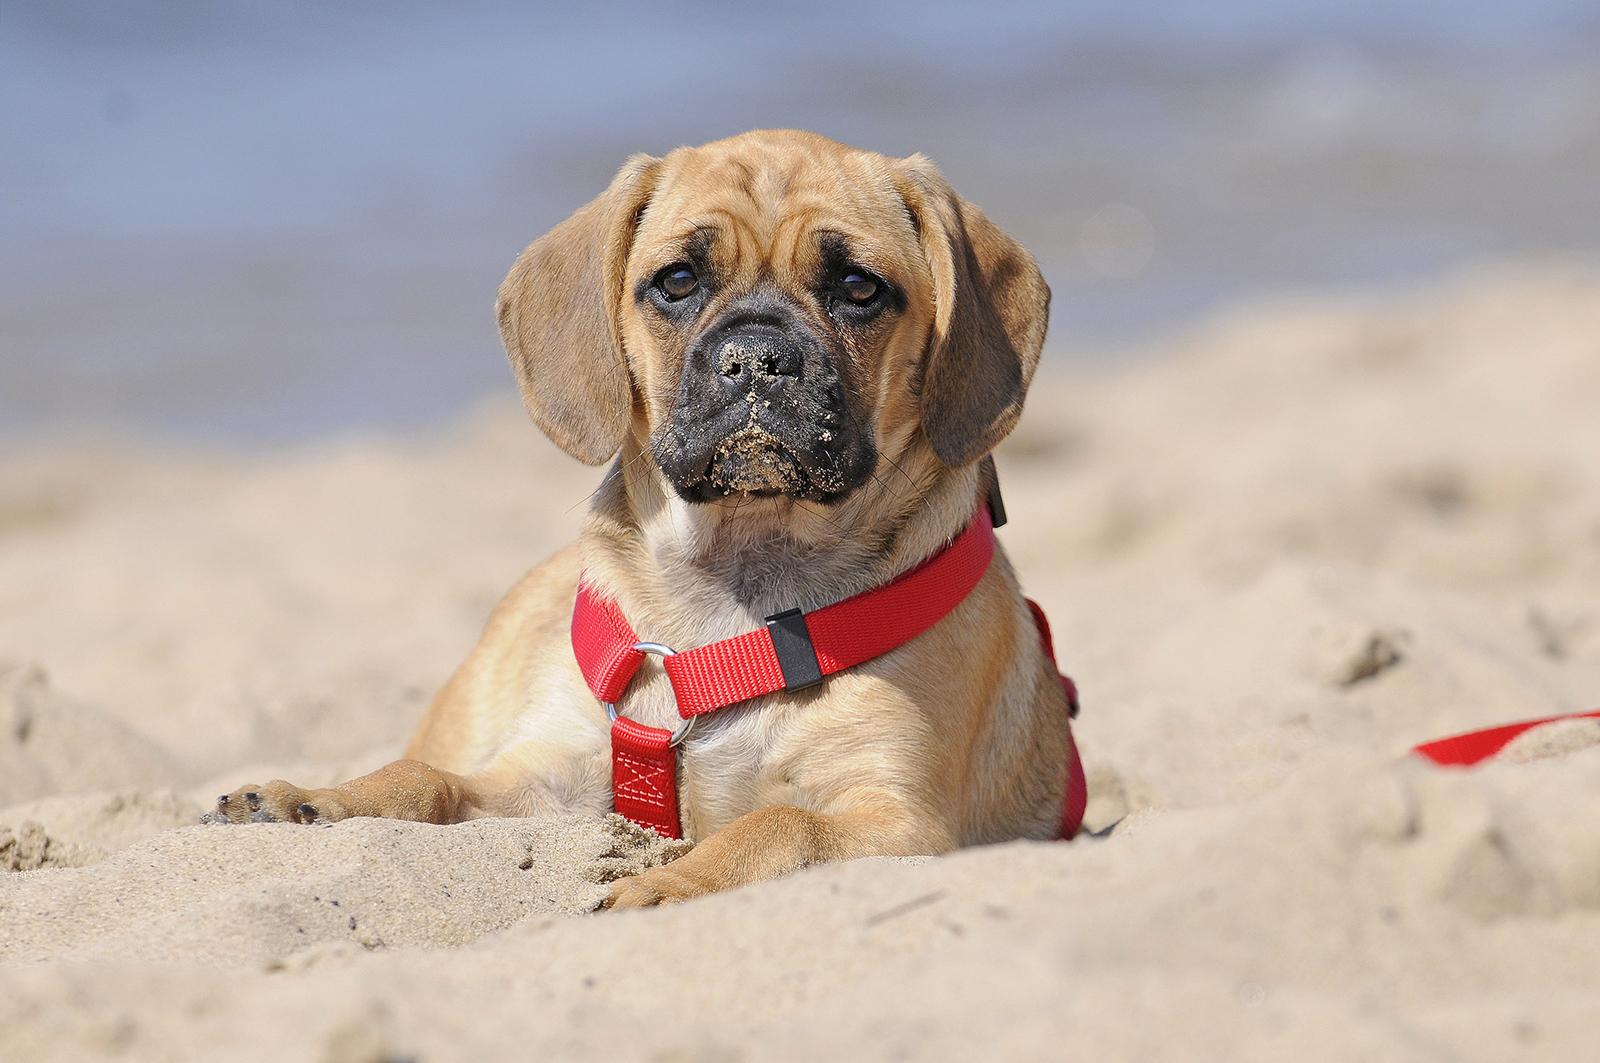 характеристики собаки породы